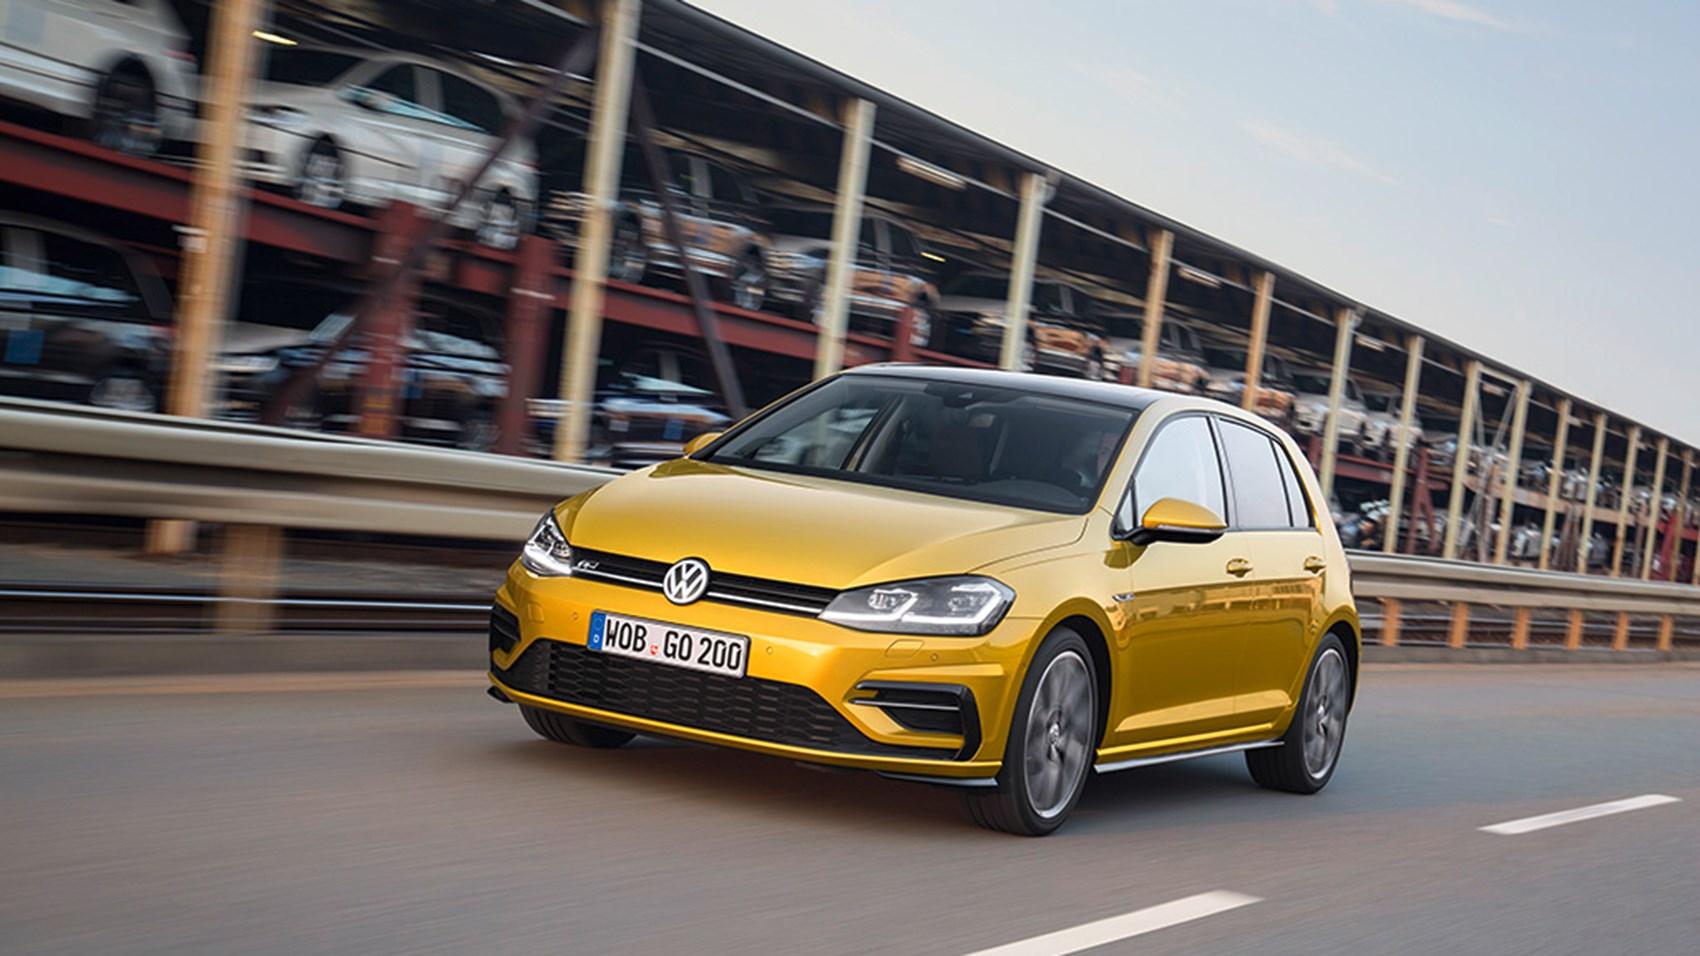 Volkswagen Golf 2 0 TDI 150 R Line 5dr 2017 review